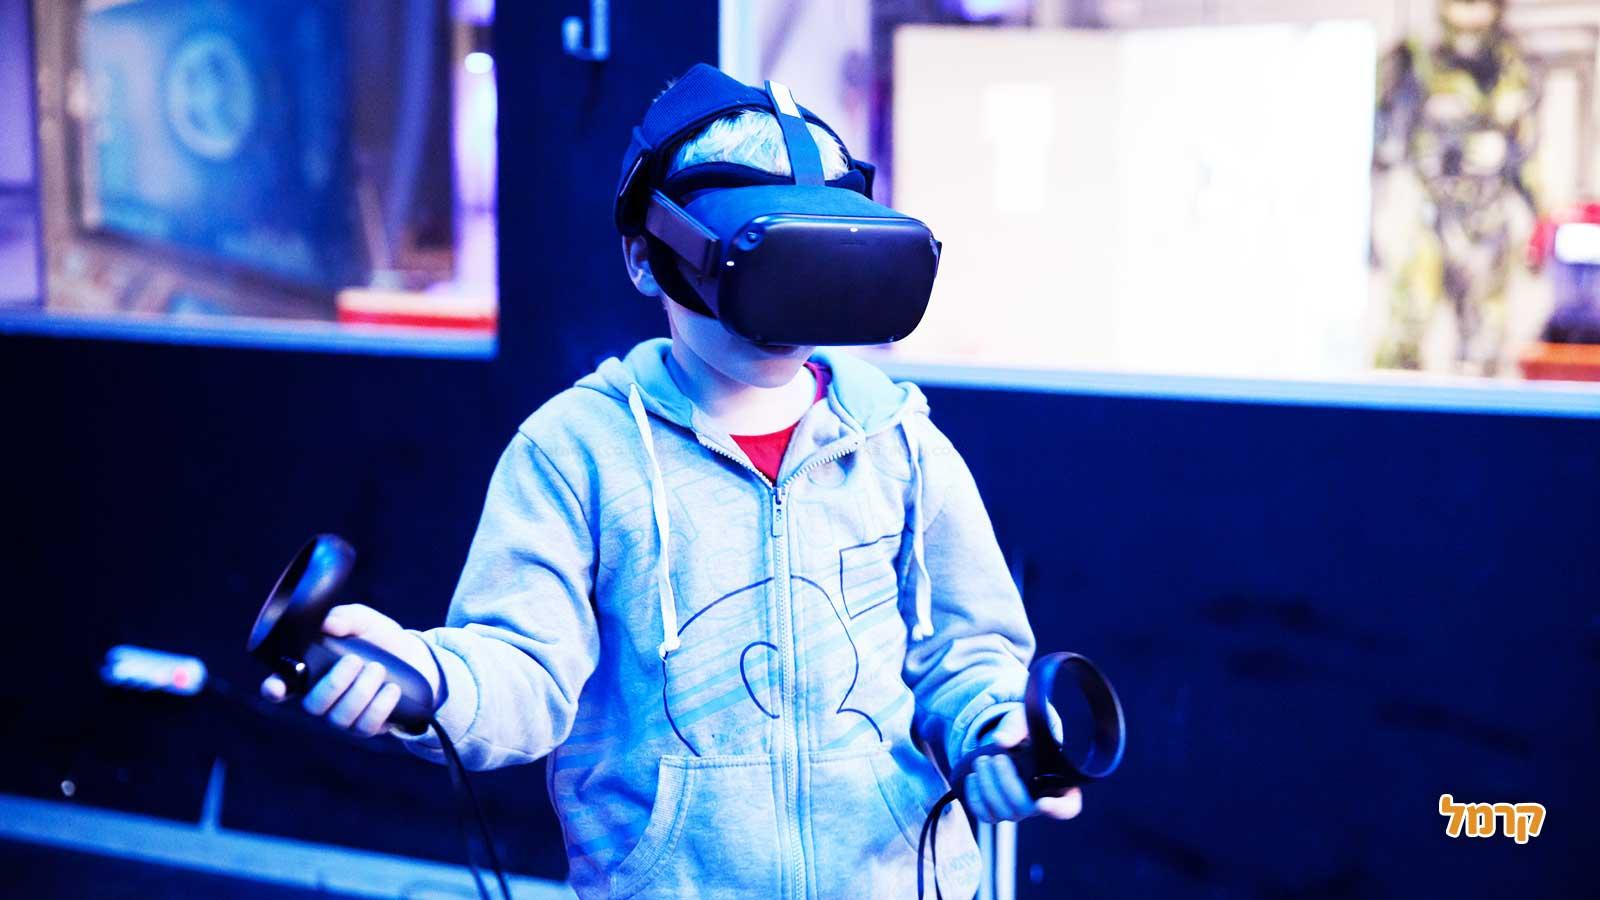 I love VR - חווית מציאות מדומה - 073-7026497